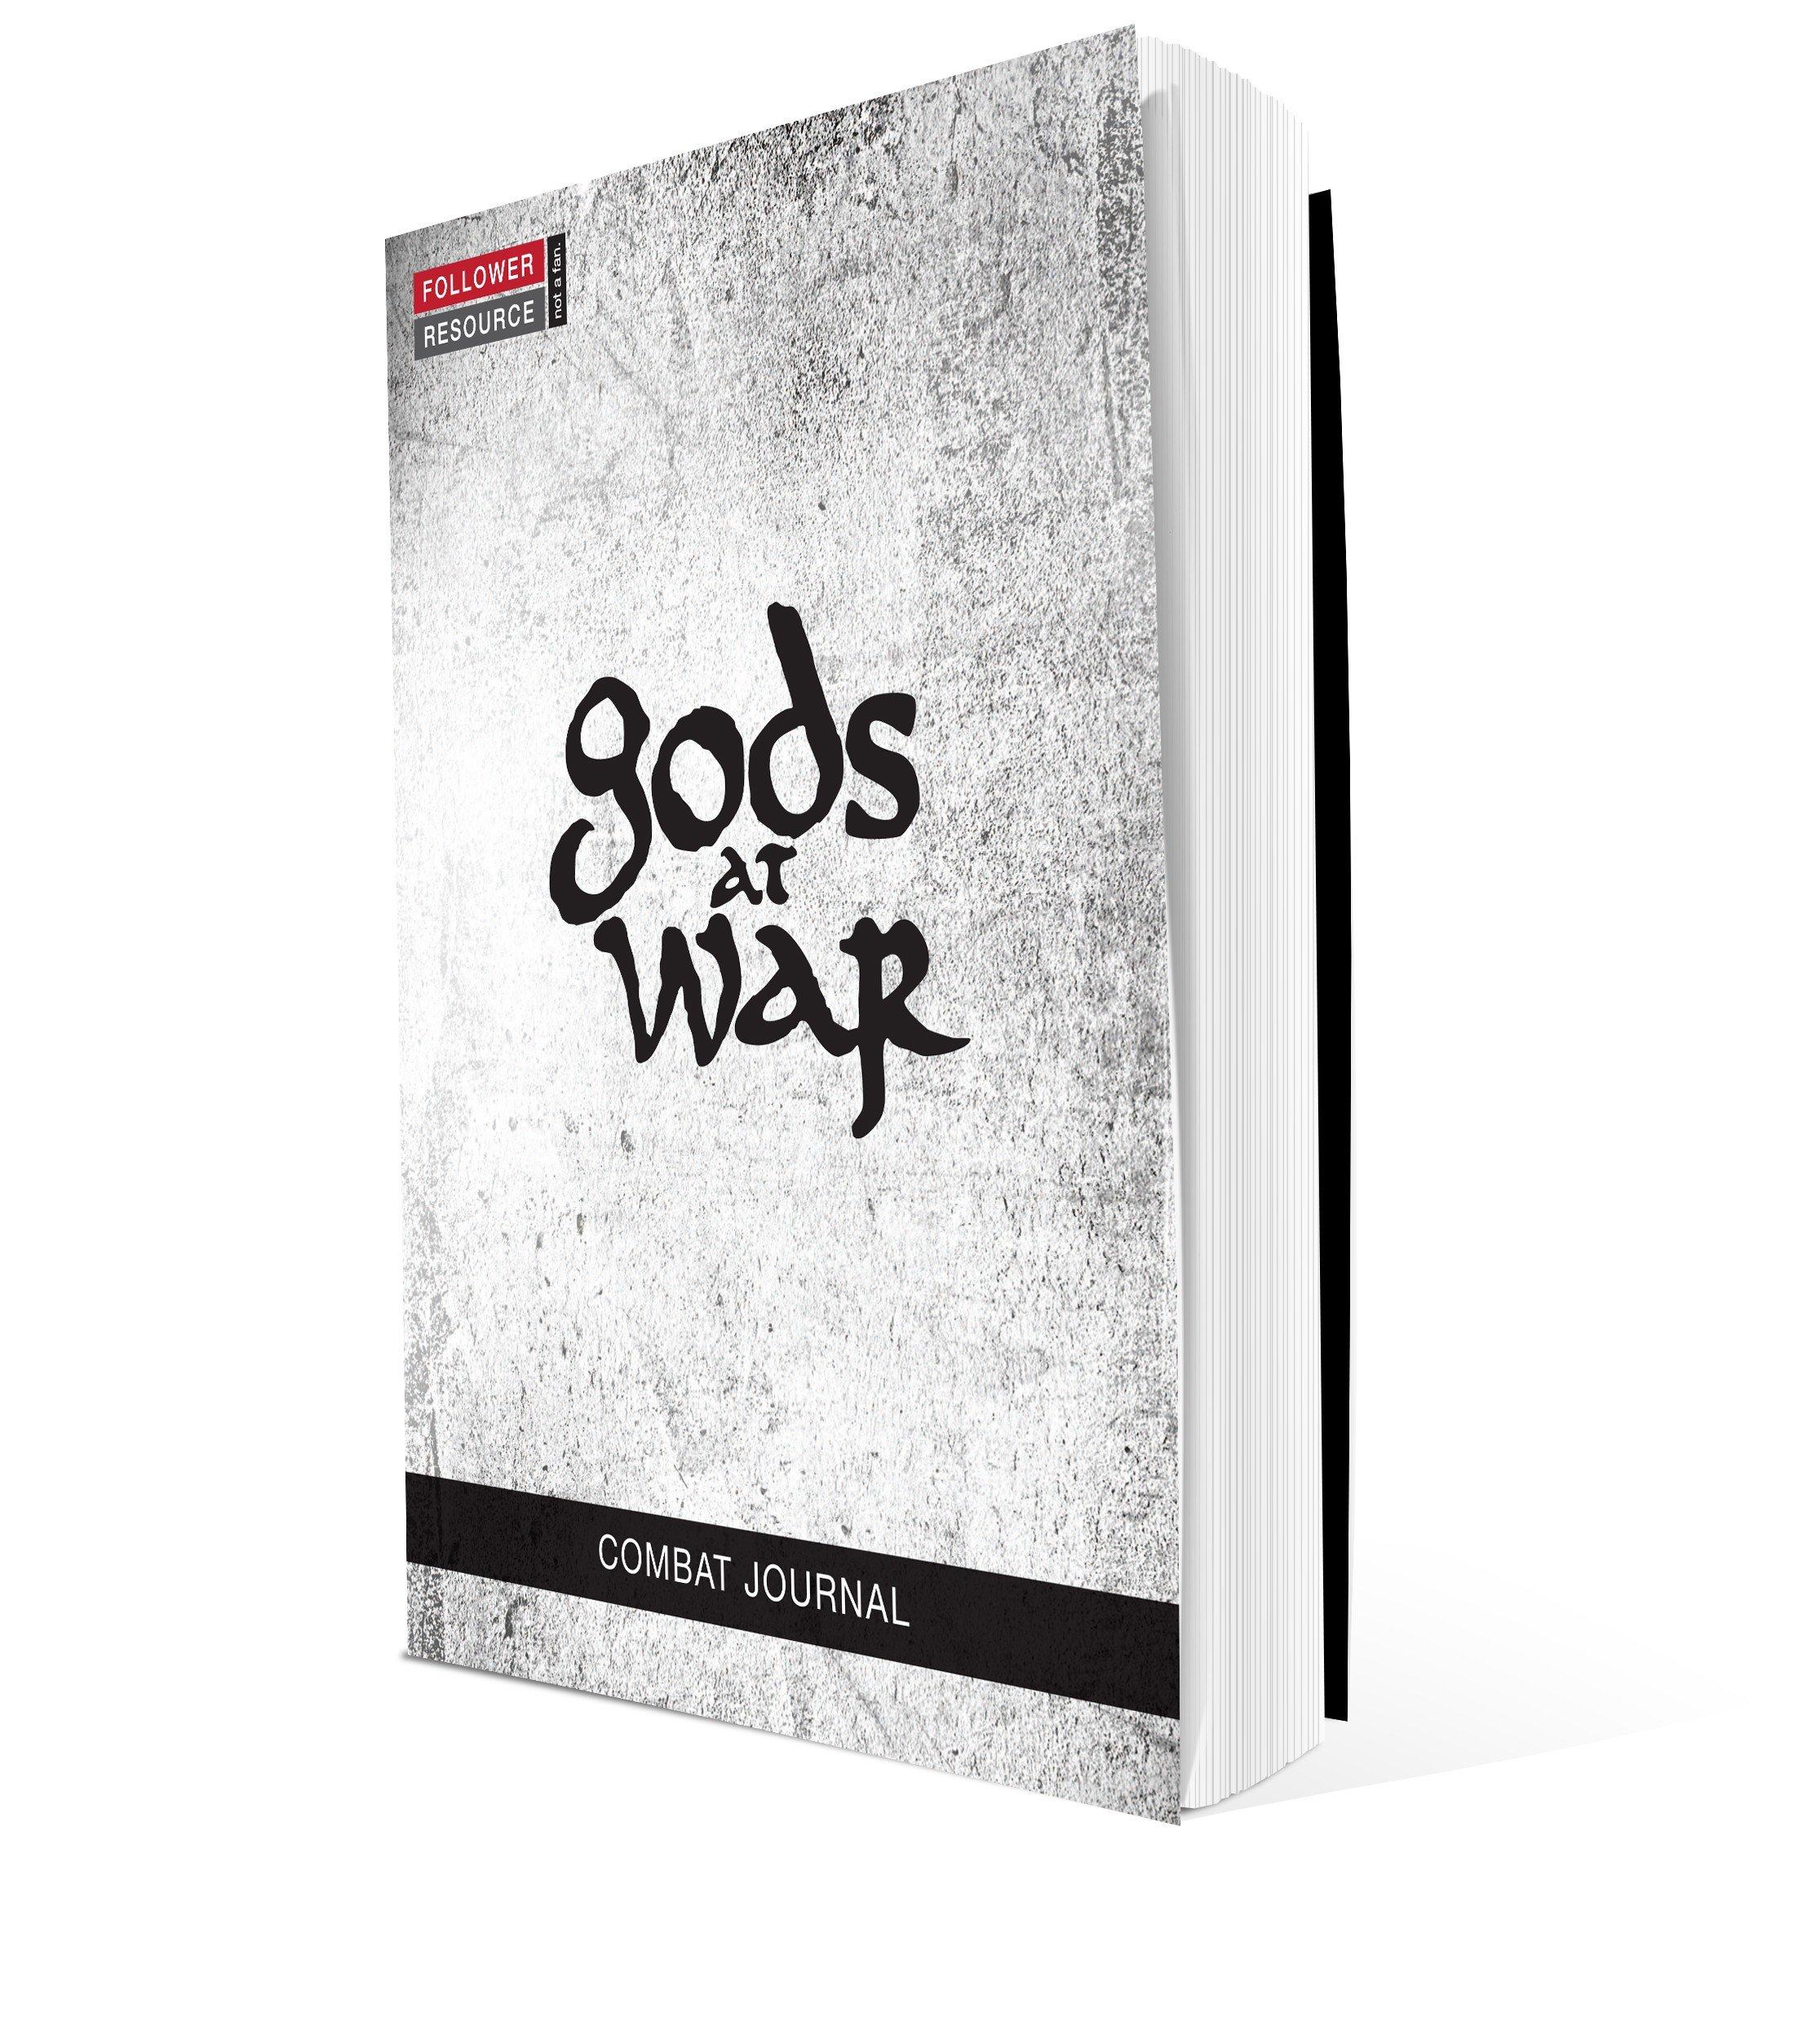 Download Gods at War Combat Journal PDF